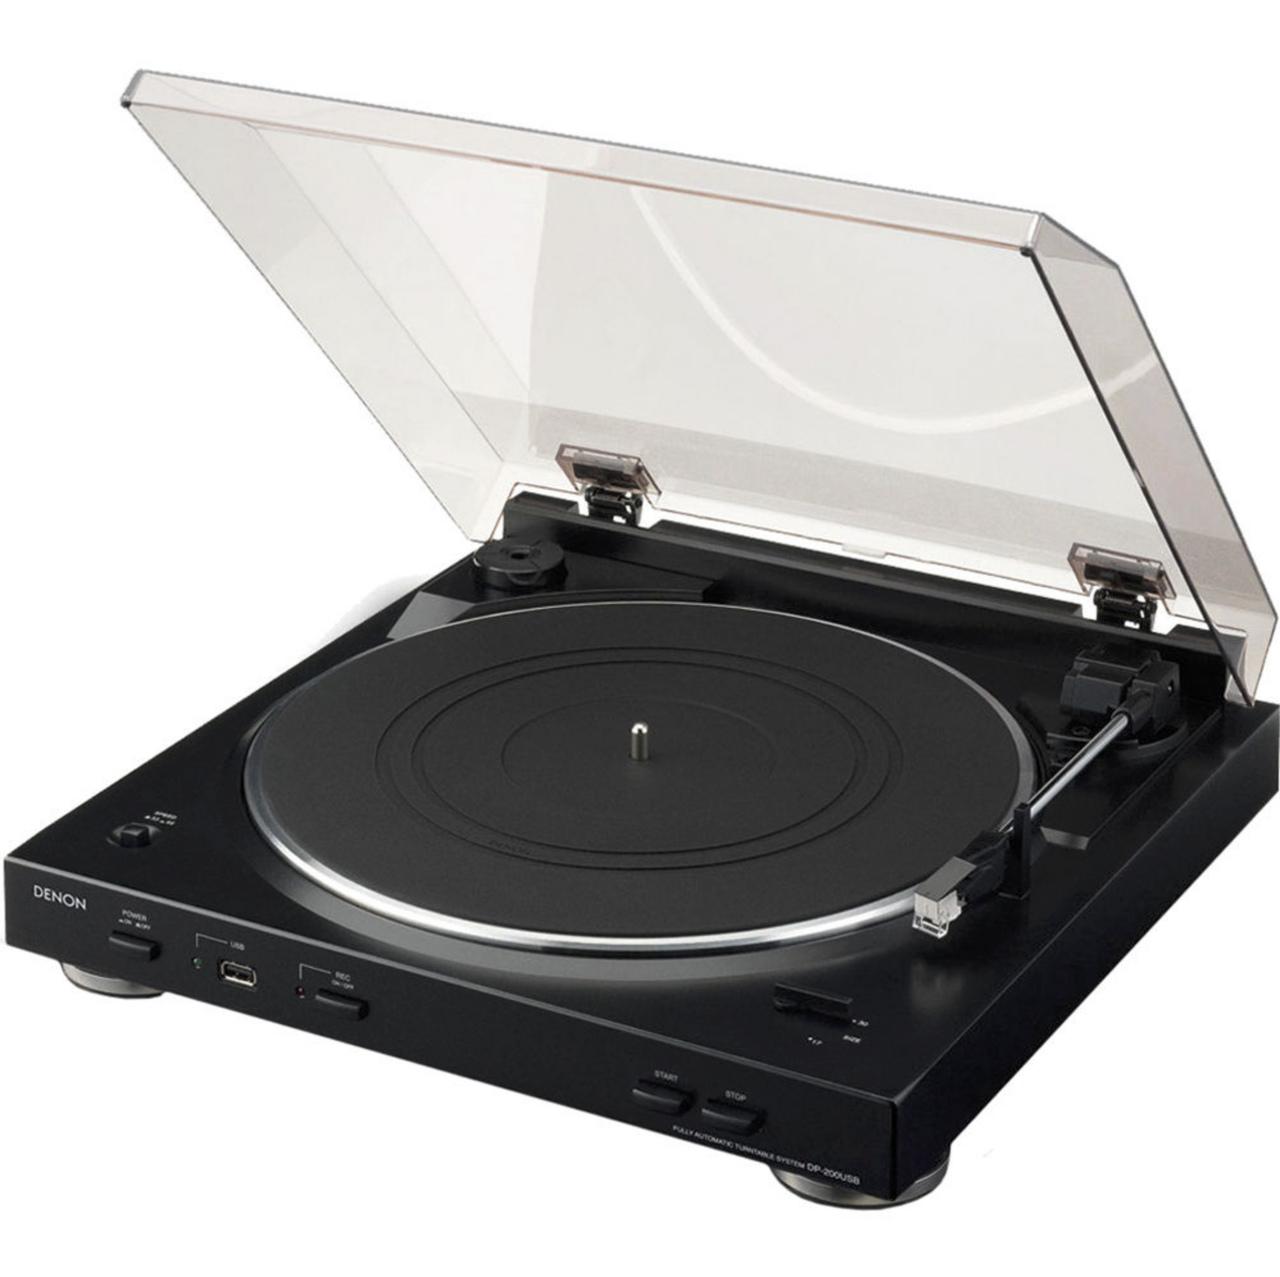 Toca discos Denon DP-200USB Automático 110v ( Caixa aberta )